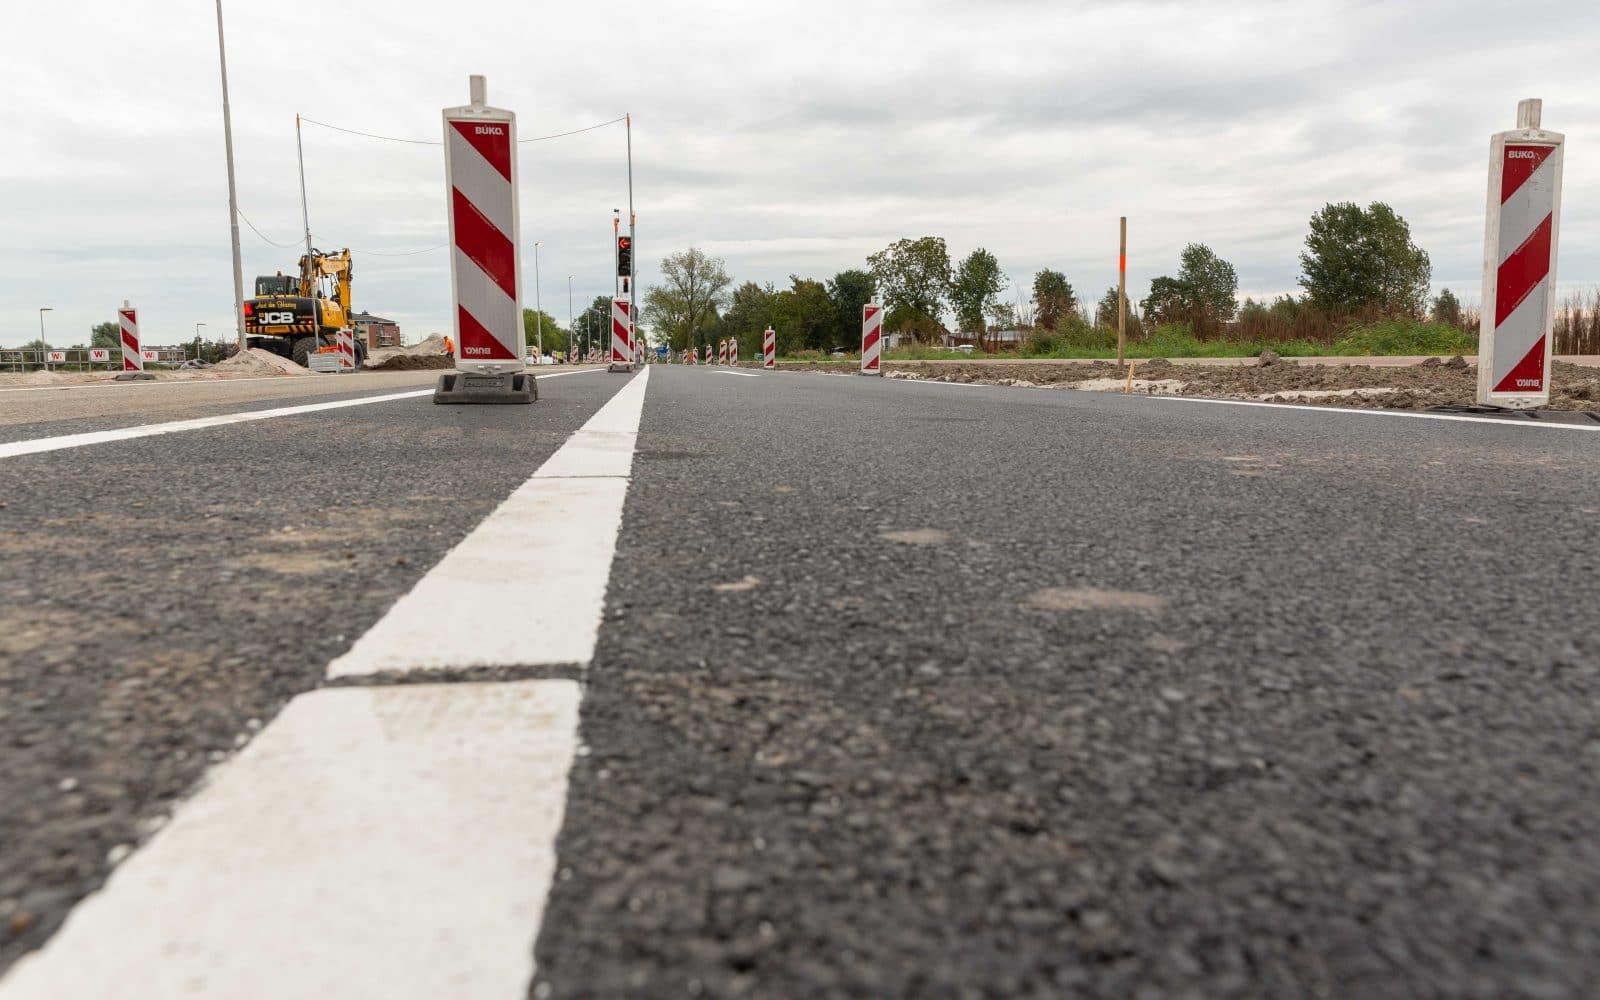 RPS-case-provincie-zuid-holland-duurzaam-aanbesteden-asfalt-vredenburghlaan